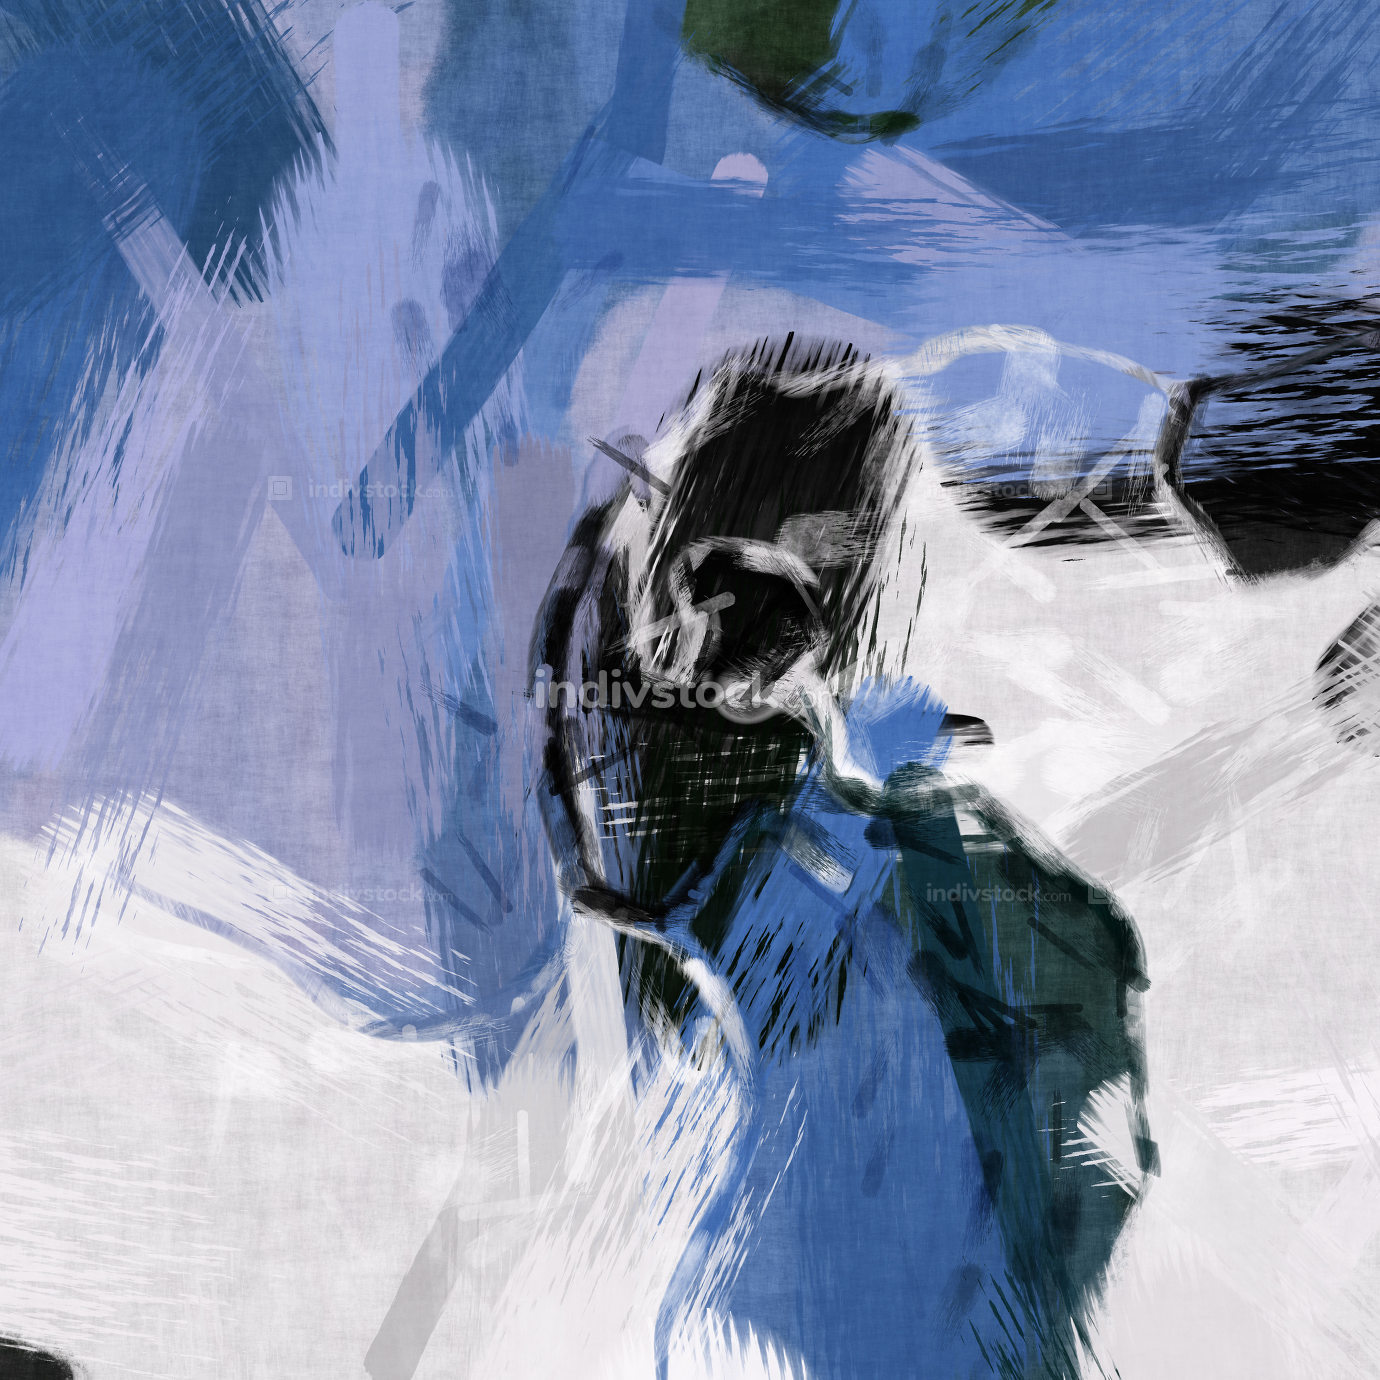 colorful digital painting artwork illustration